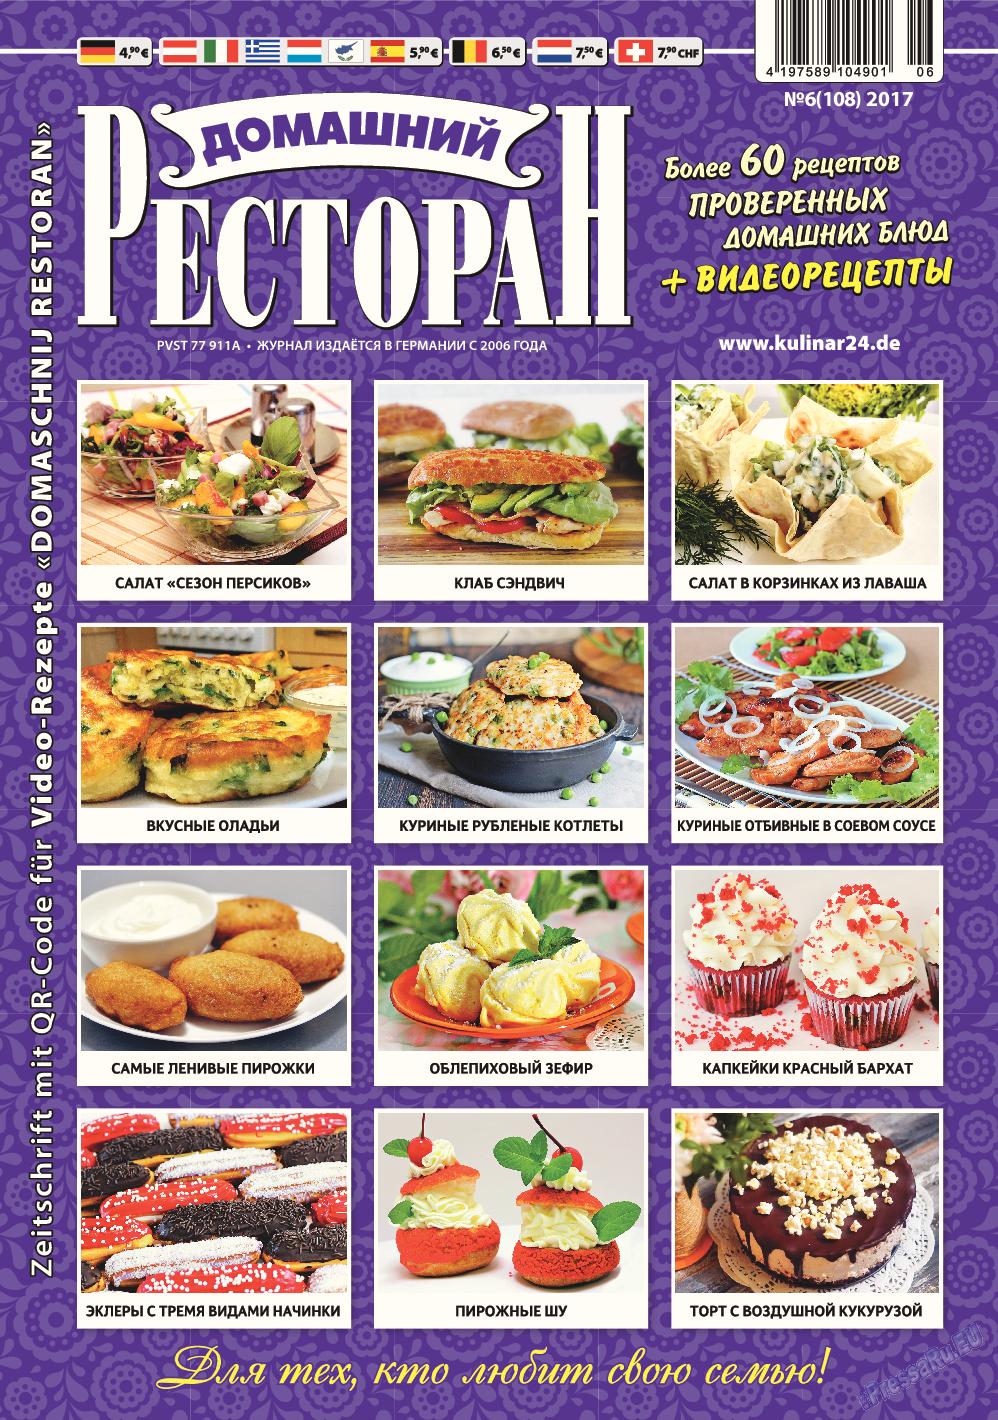 Домашний ресторан (журнал). 2017 год, номер 108, стр. 1